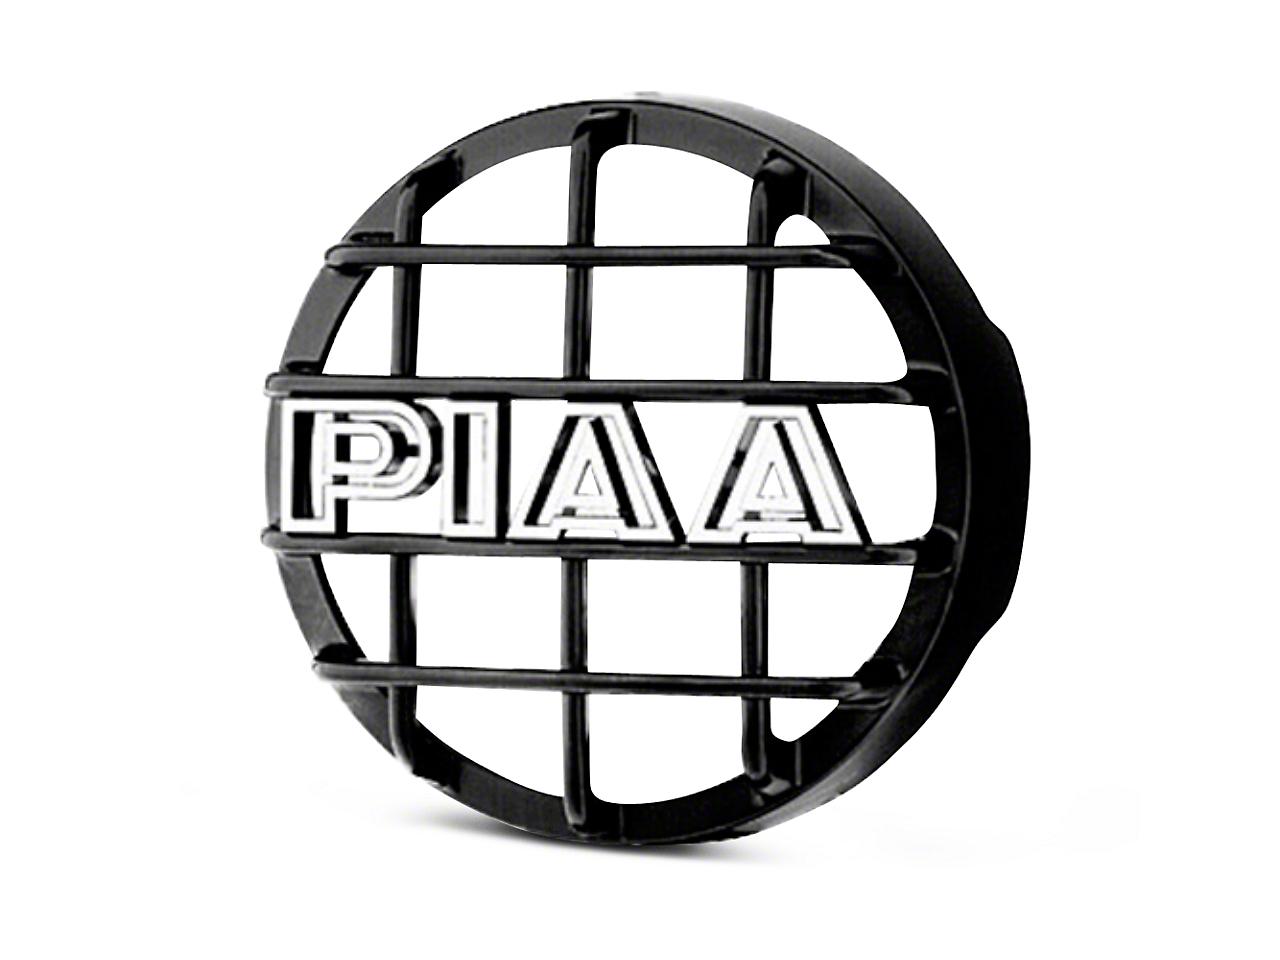 PIAA 520 Series 6 in. Round Black Mesh Grille w/ PIAA Logo (07-18 Sierra 1500)